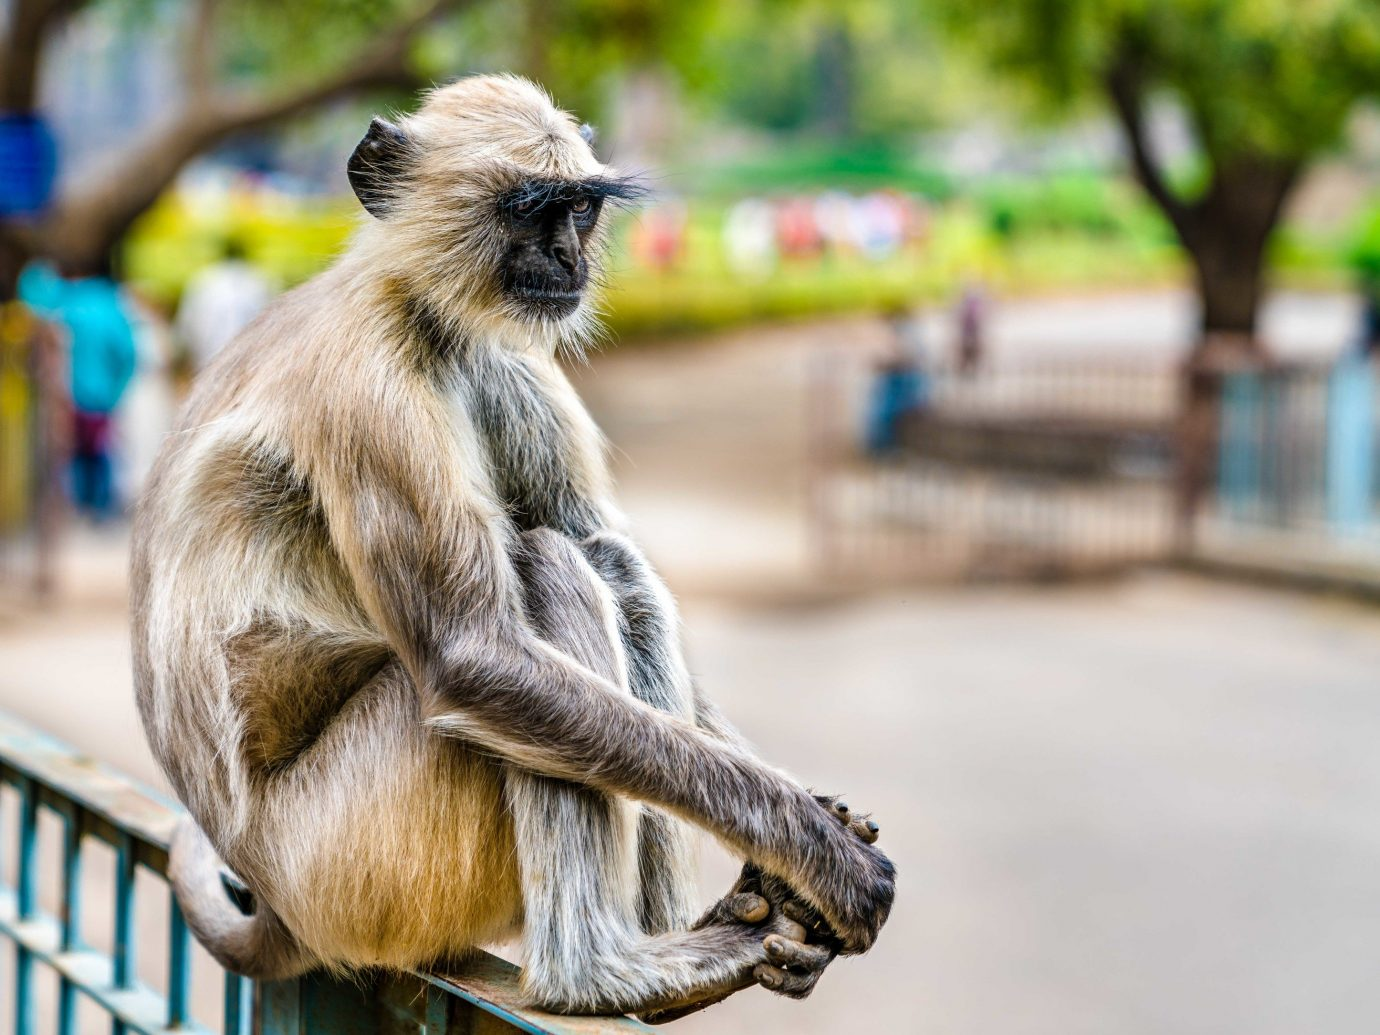 India primate animal mammal monkey outdoor fauna macaque old world monkey temple Wildlife